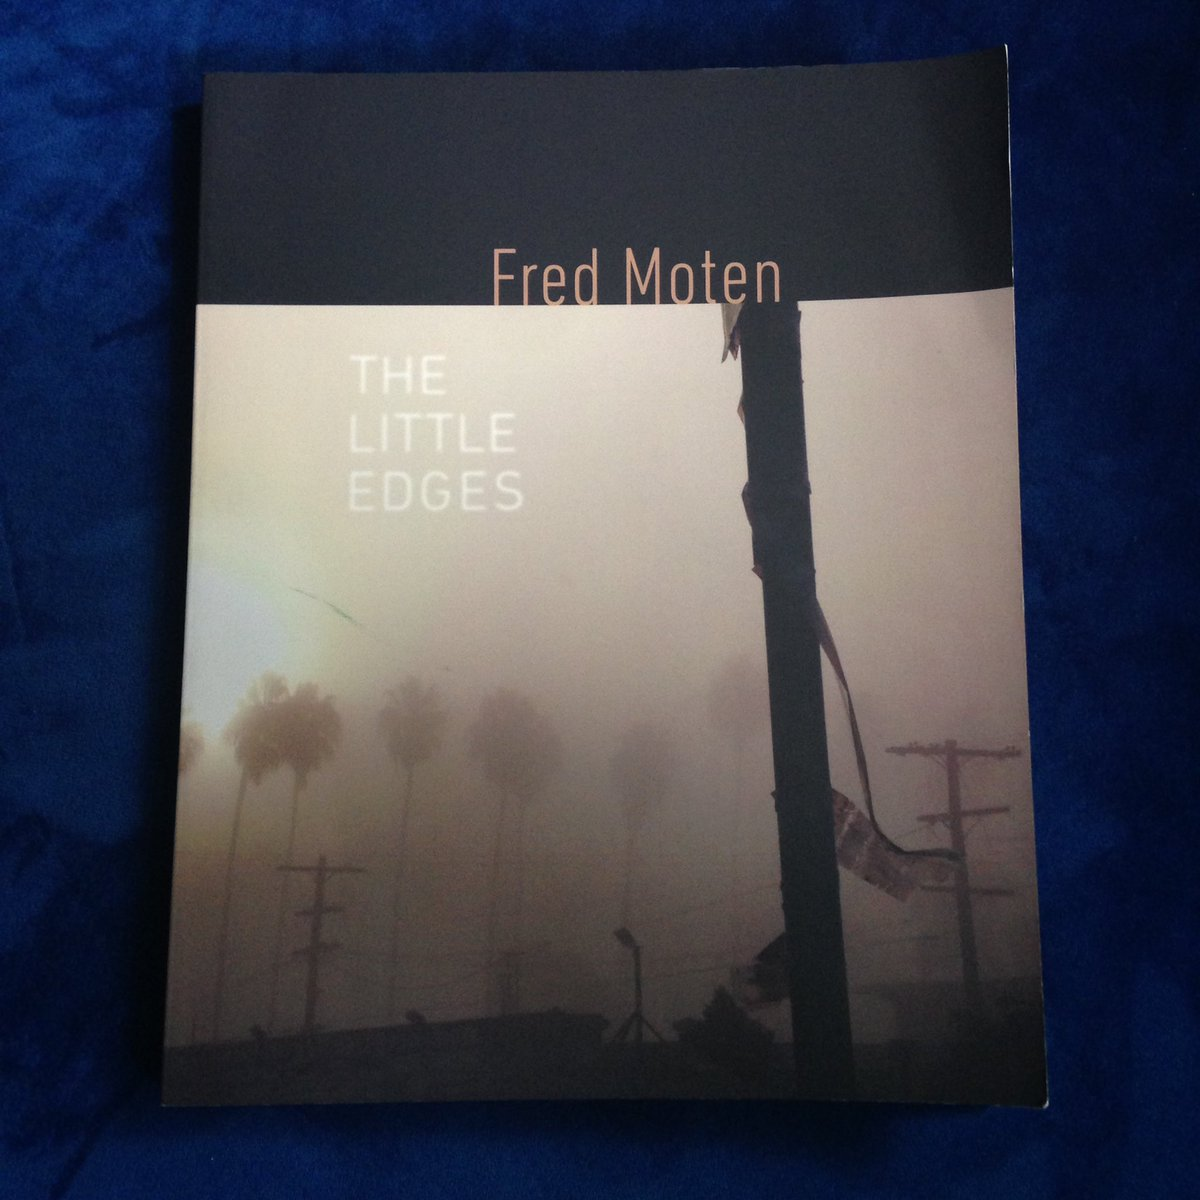 test Twitter Media - RT @AmorousShepherd: THE LITTLE EDGES by Fred Moten, @weslpress #TheSealeyChallenge @Nic_Sealey https://t.co/w8q0qUaOXN